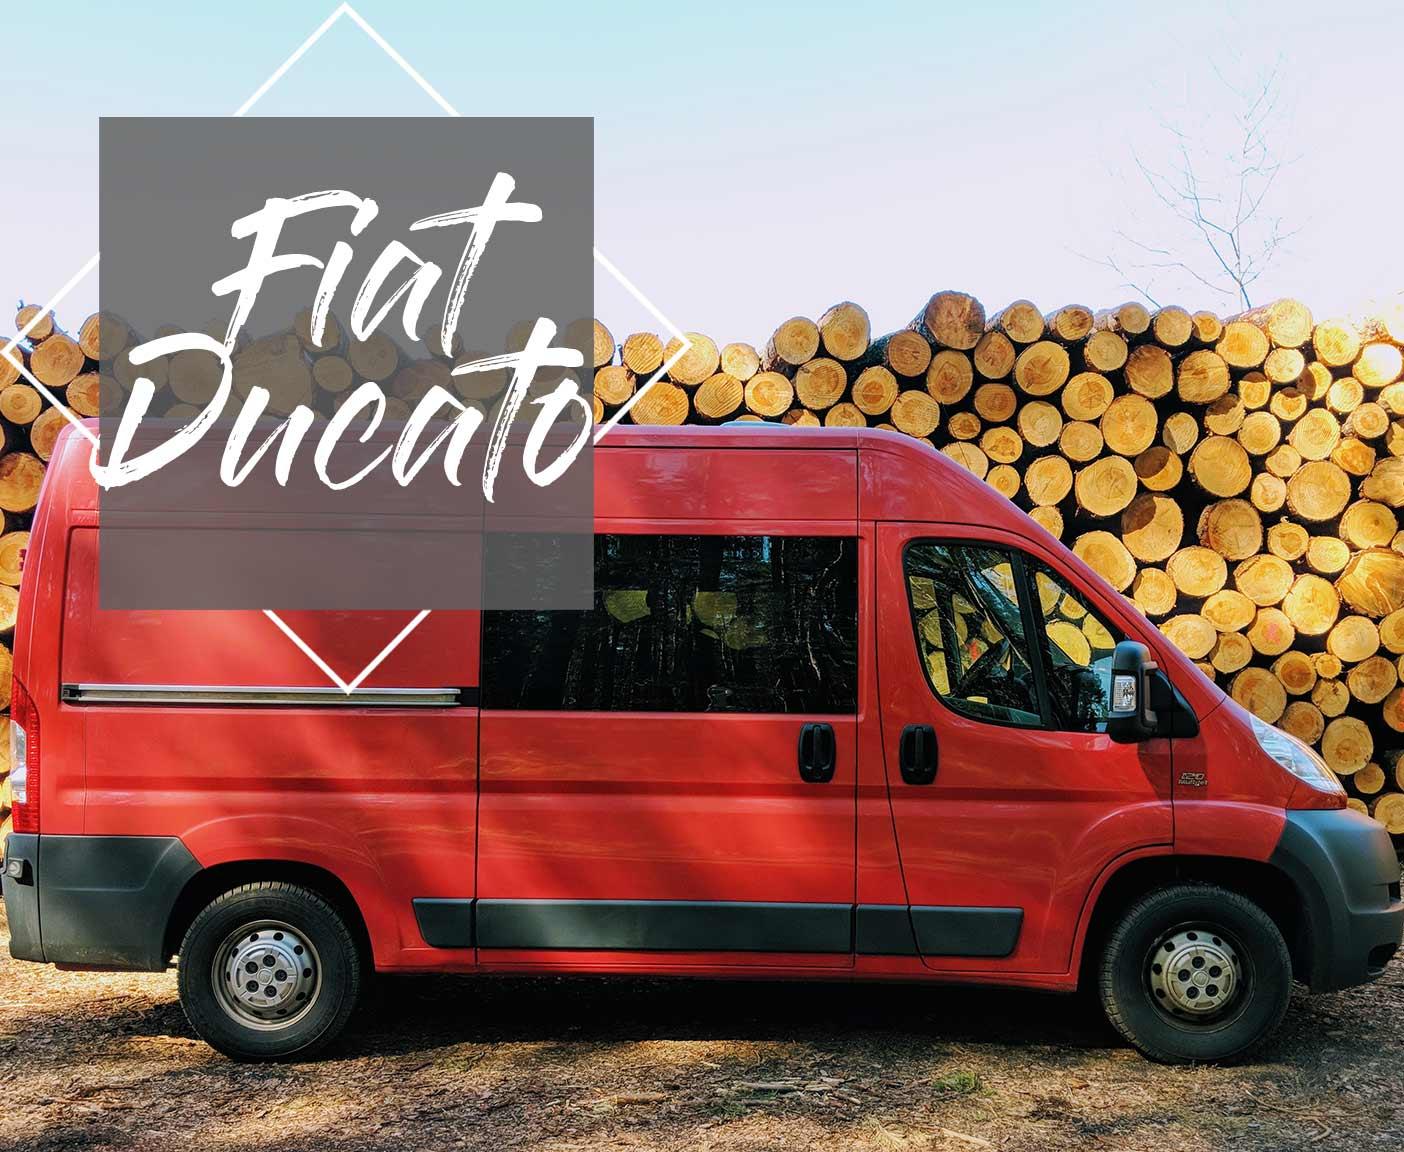 Fiat-ducato-modelle-wohnmobil-camper-holzstapel-van-kastenwagen